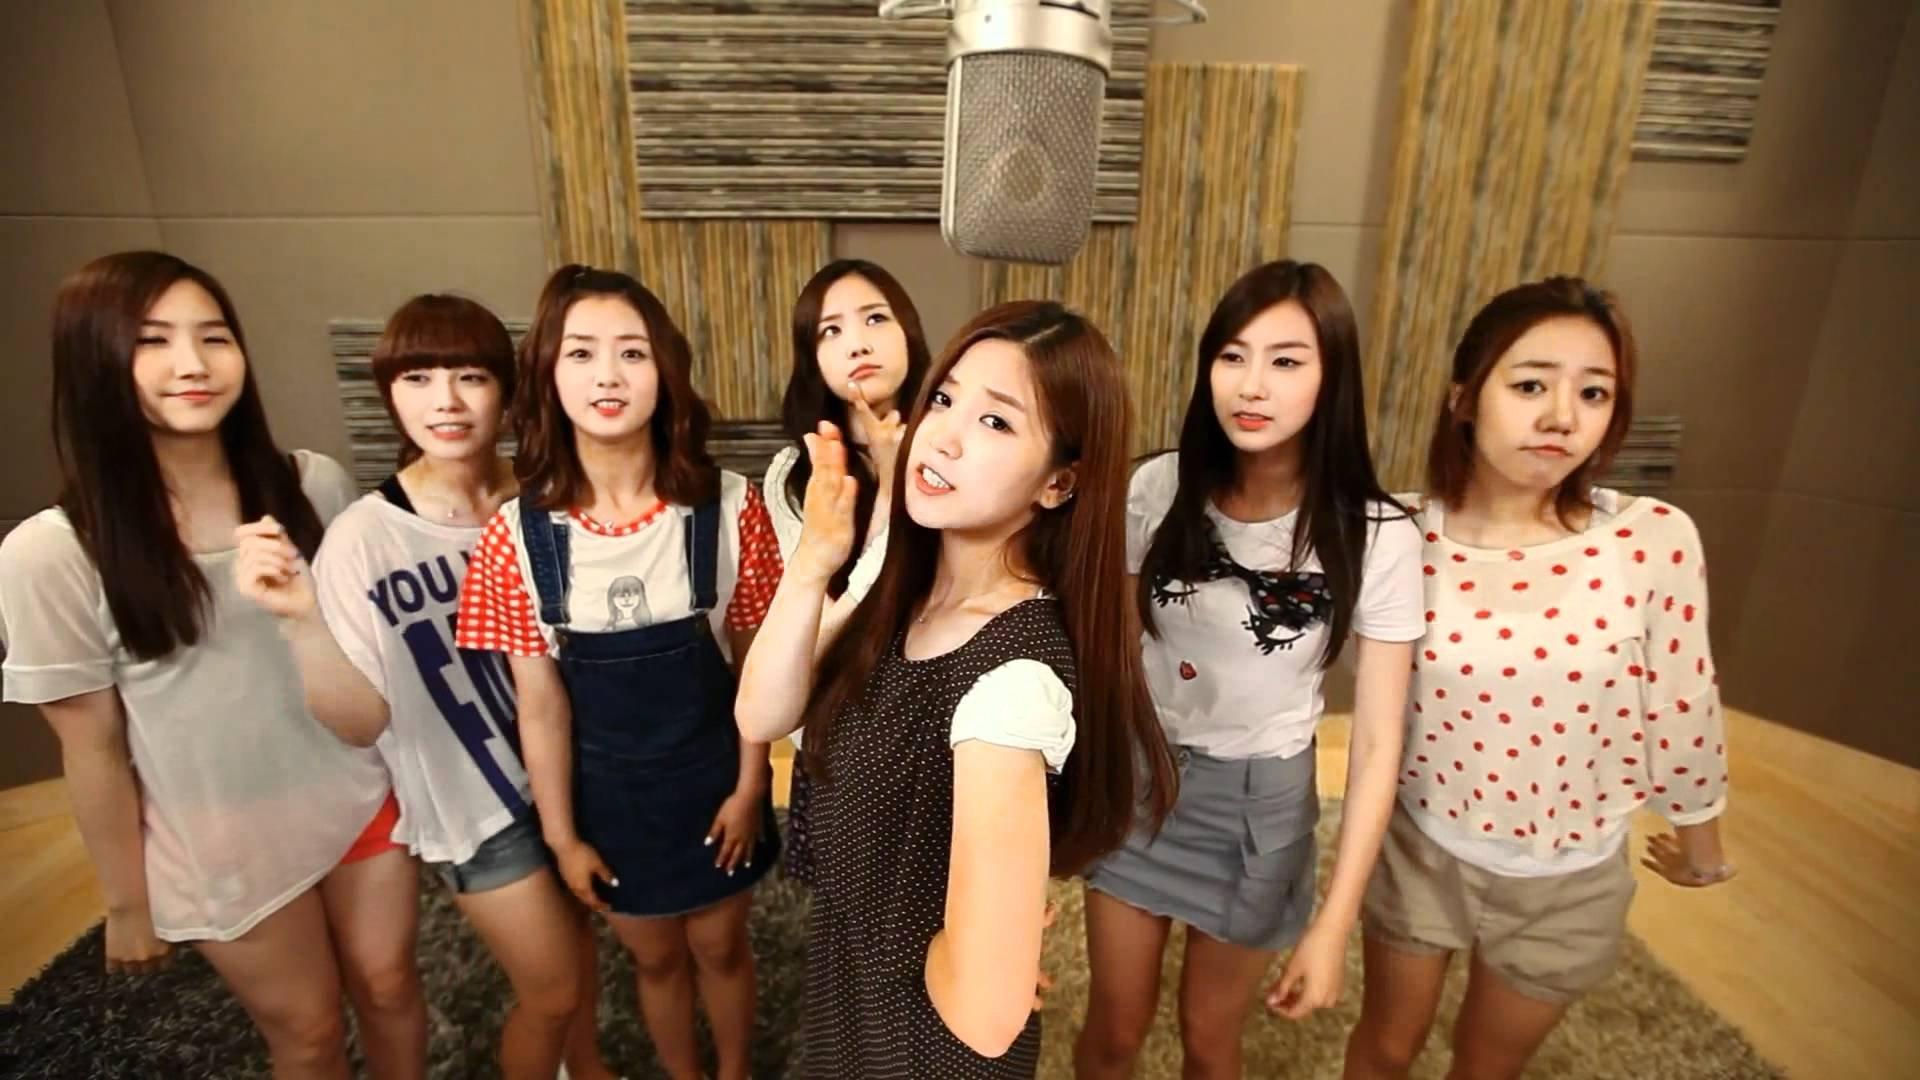 PINK dance pop kpop k-pop apink wallpaper backgroundApink Wallpaper 1920x1080